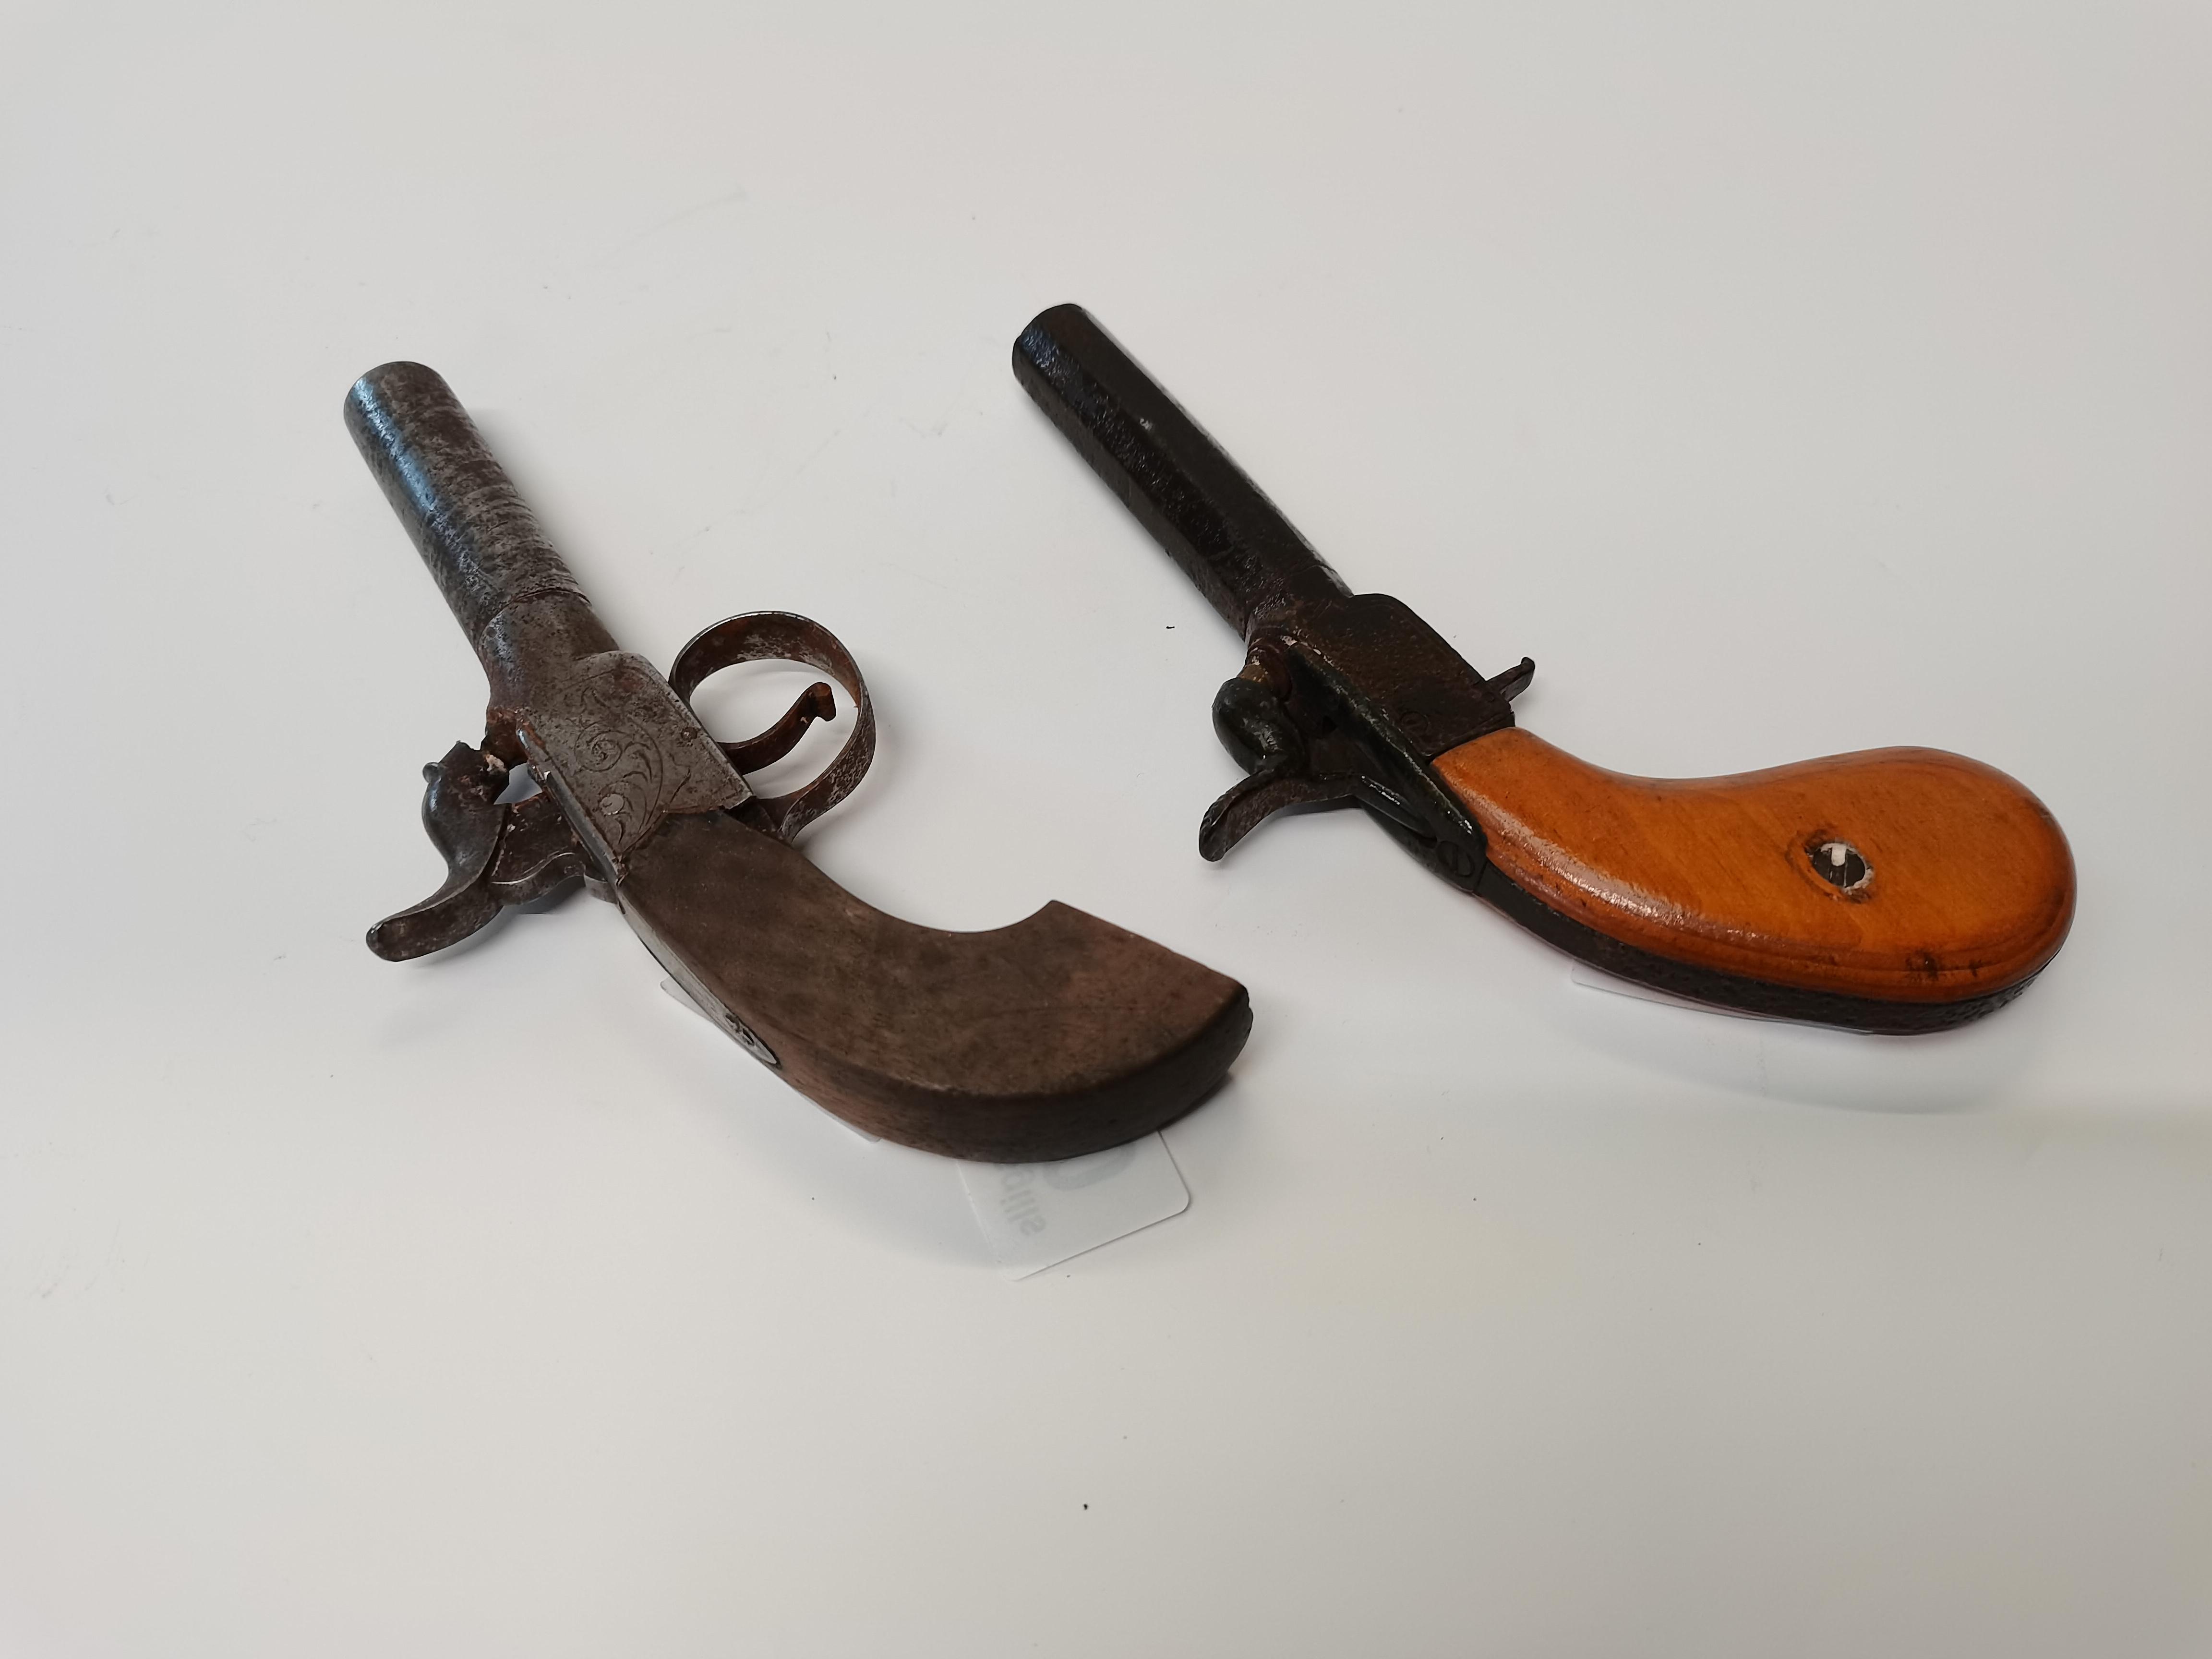 2 x small pistols - Image 2 of 2